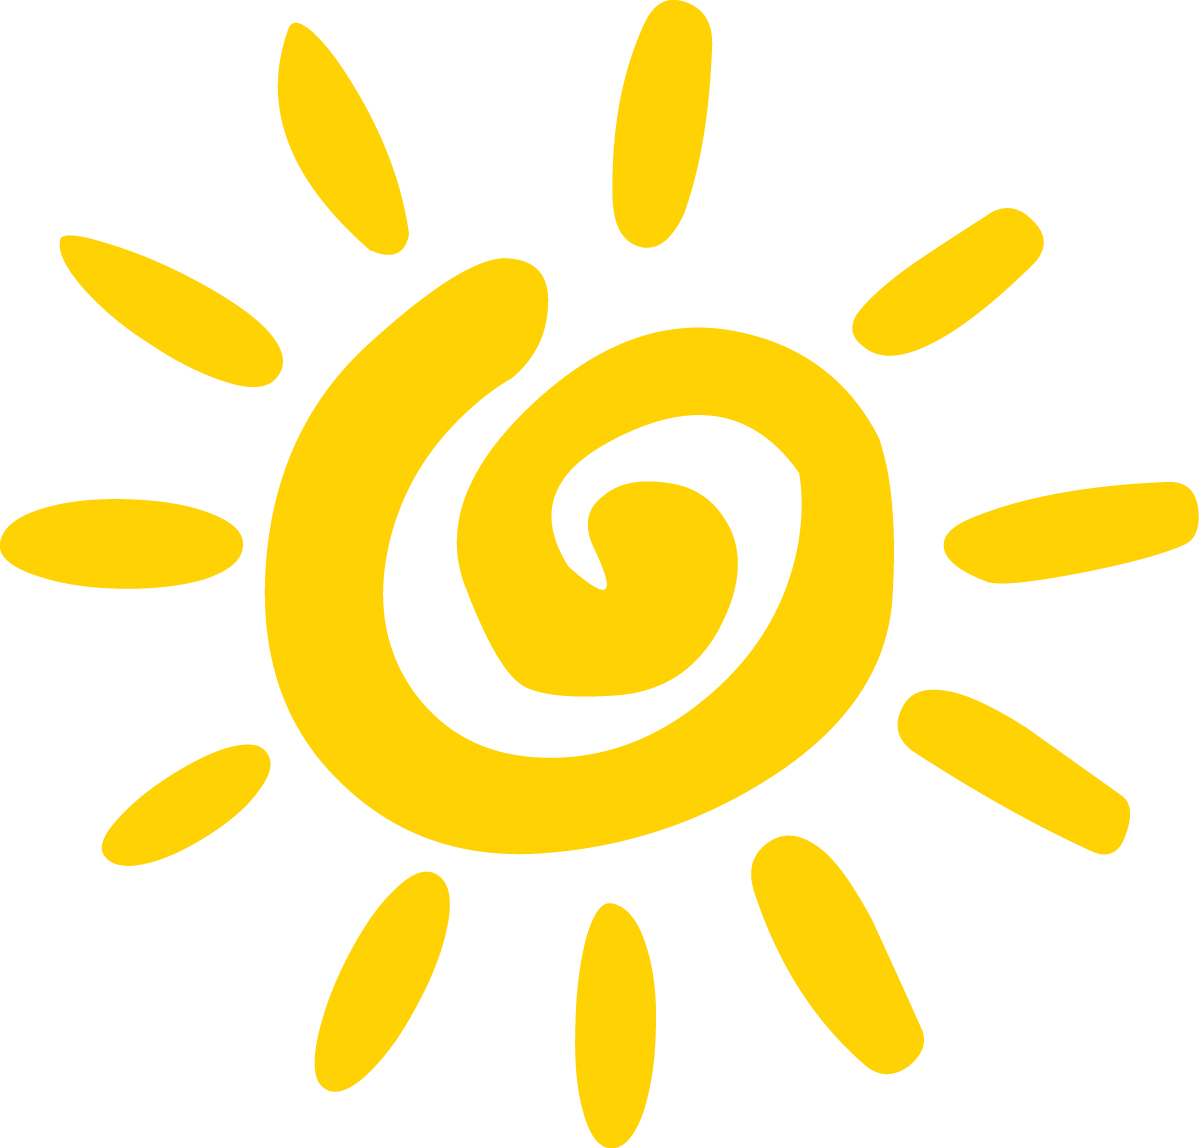 Sun Clipart Free Images At Clker Com Vec-Sun Clipart Free Images At Clker Com Vector Clip Art Online-11